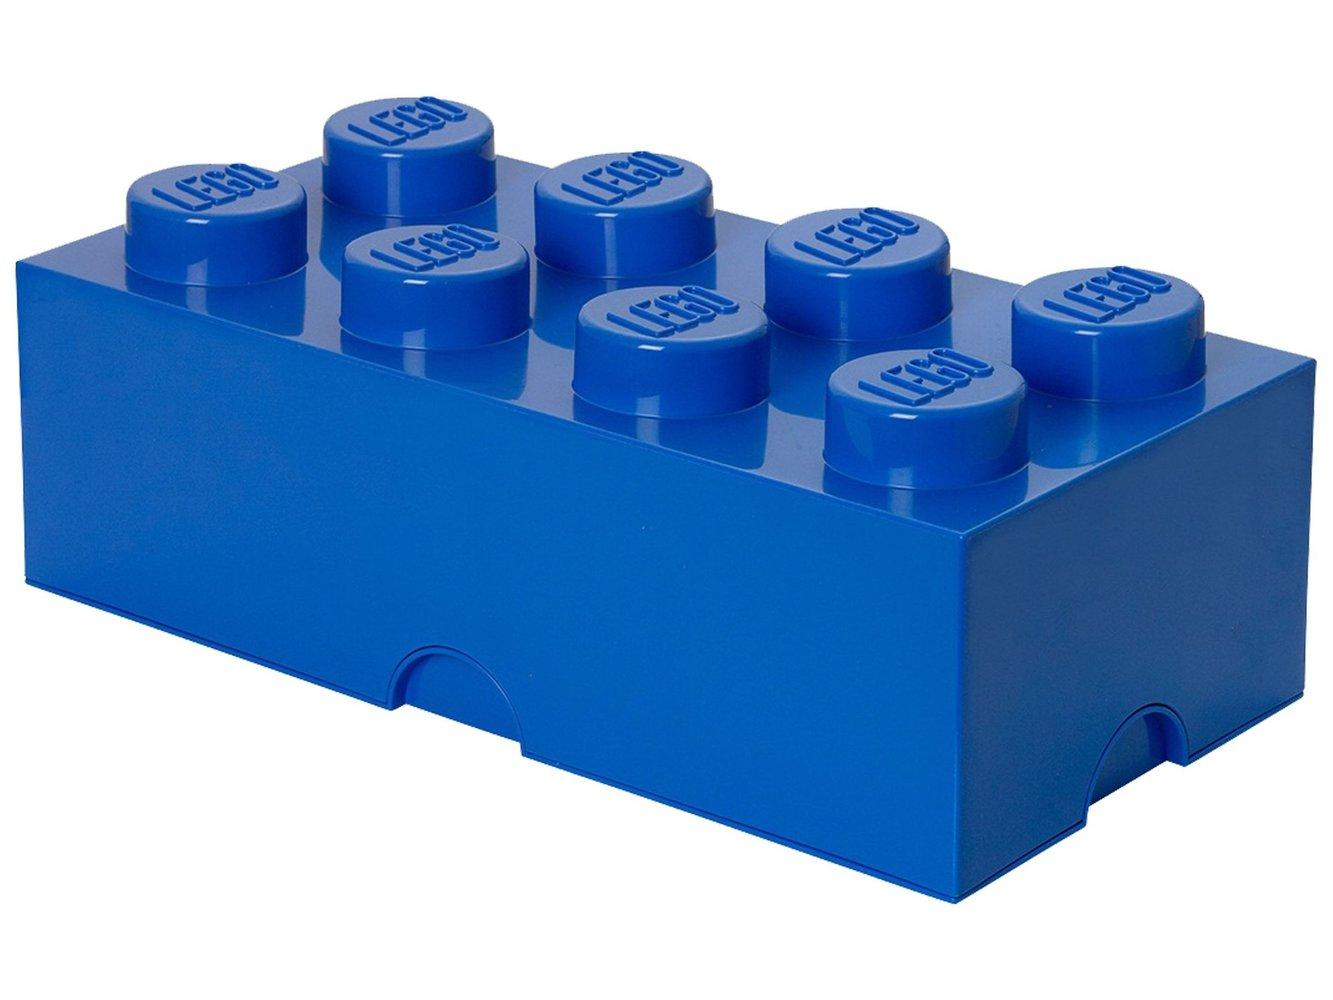 8 stud Blue Storage Brick